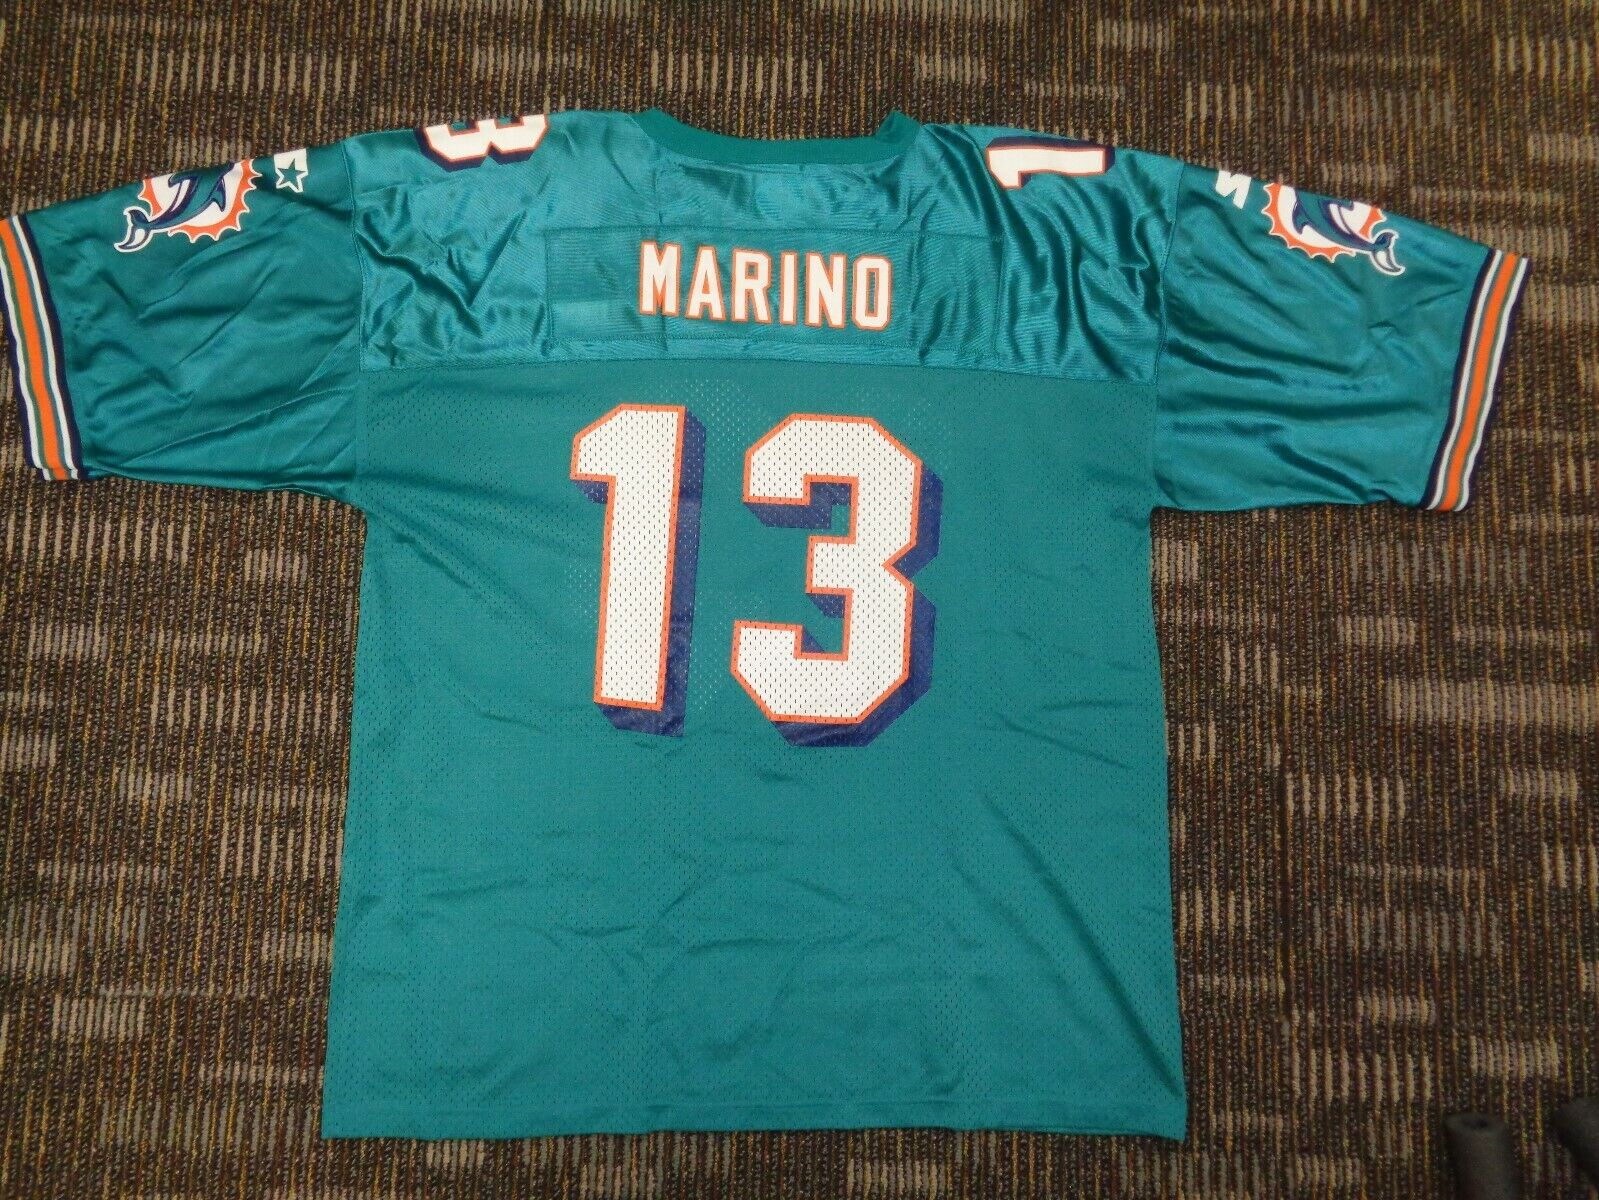 DAN MARINO 13 MIAMI DOLPHINS FISH STARTER MENS GREEN NFL GAME FOOTBALL JERSEY  - $49.99